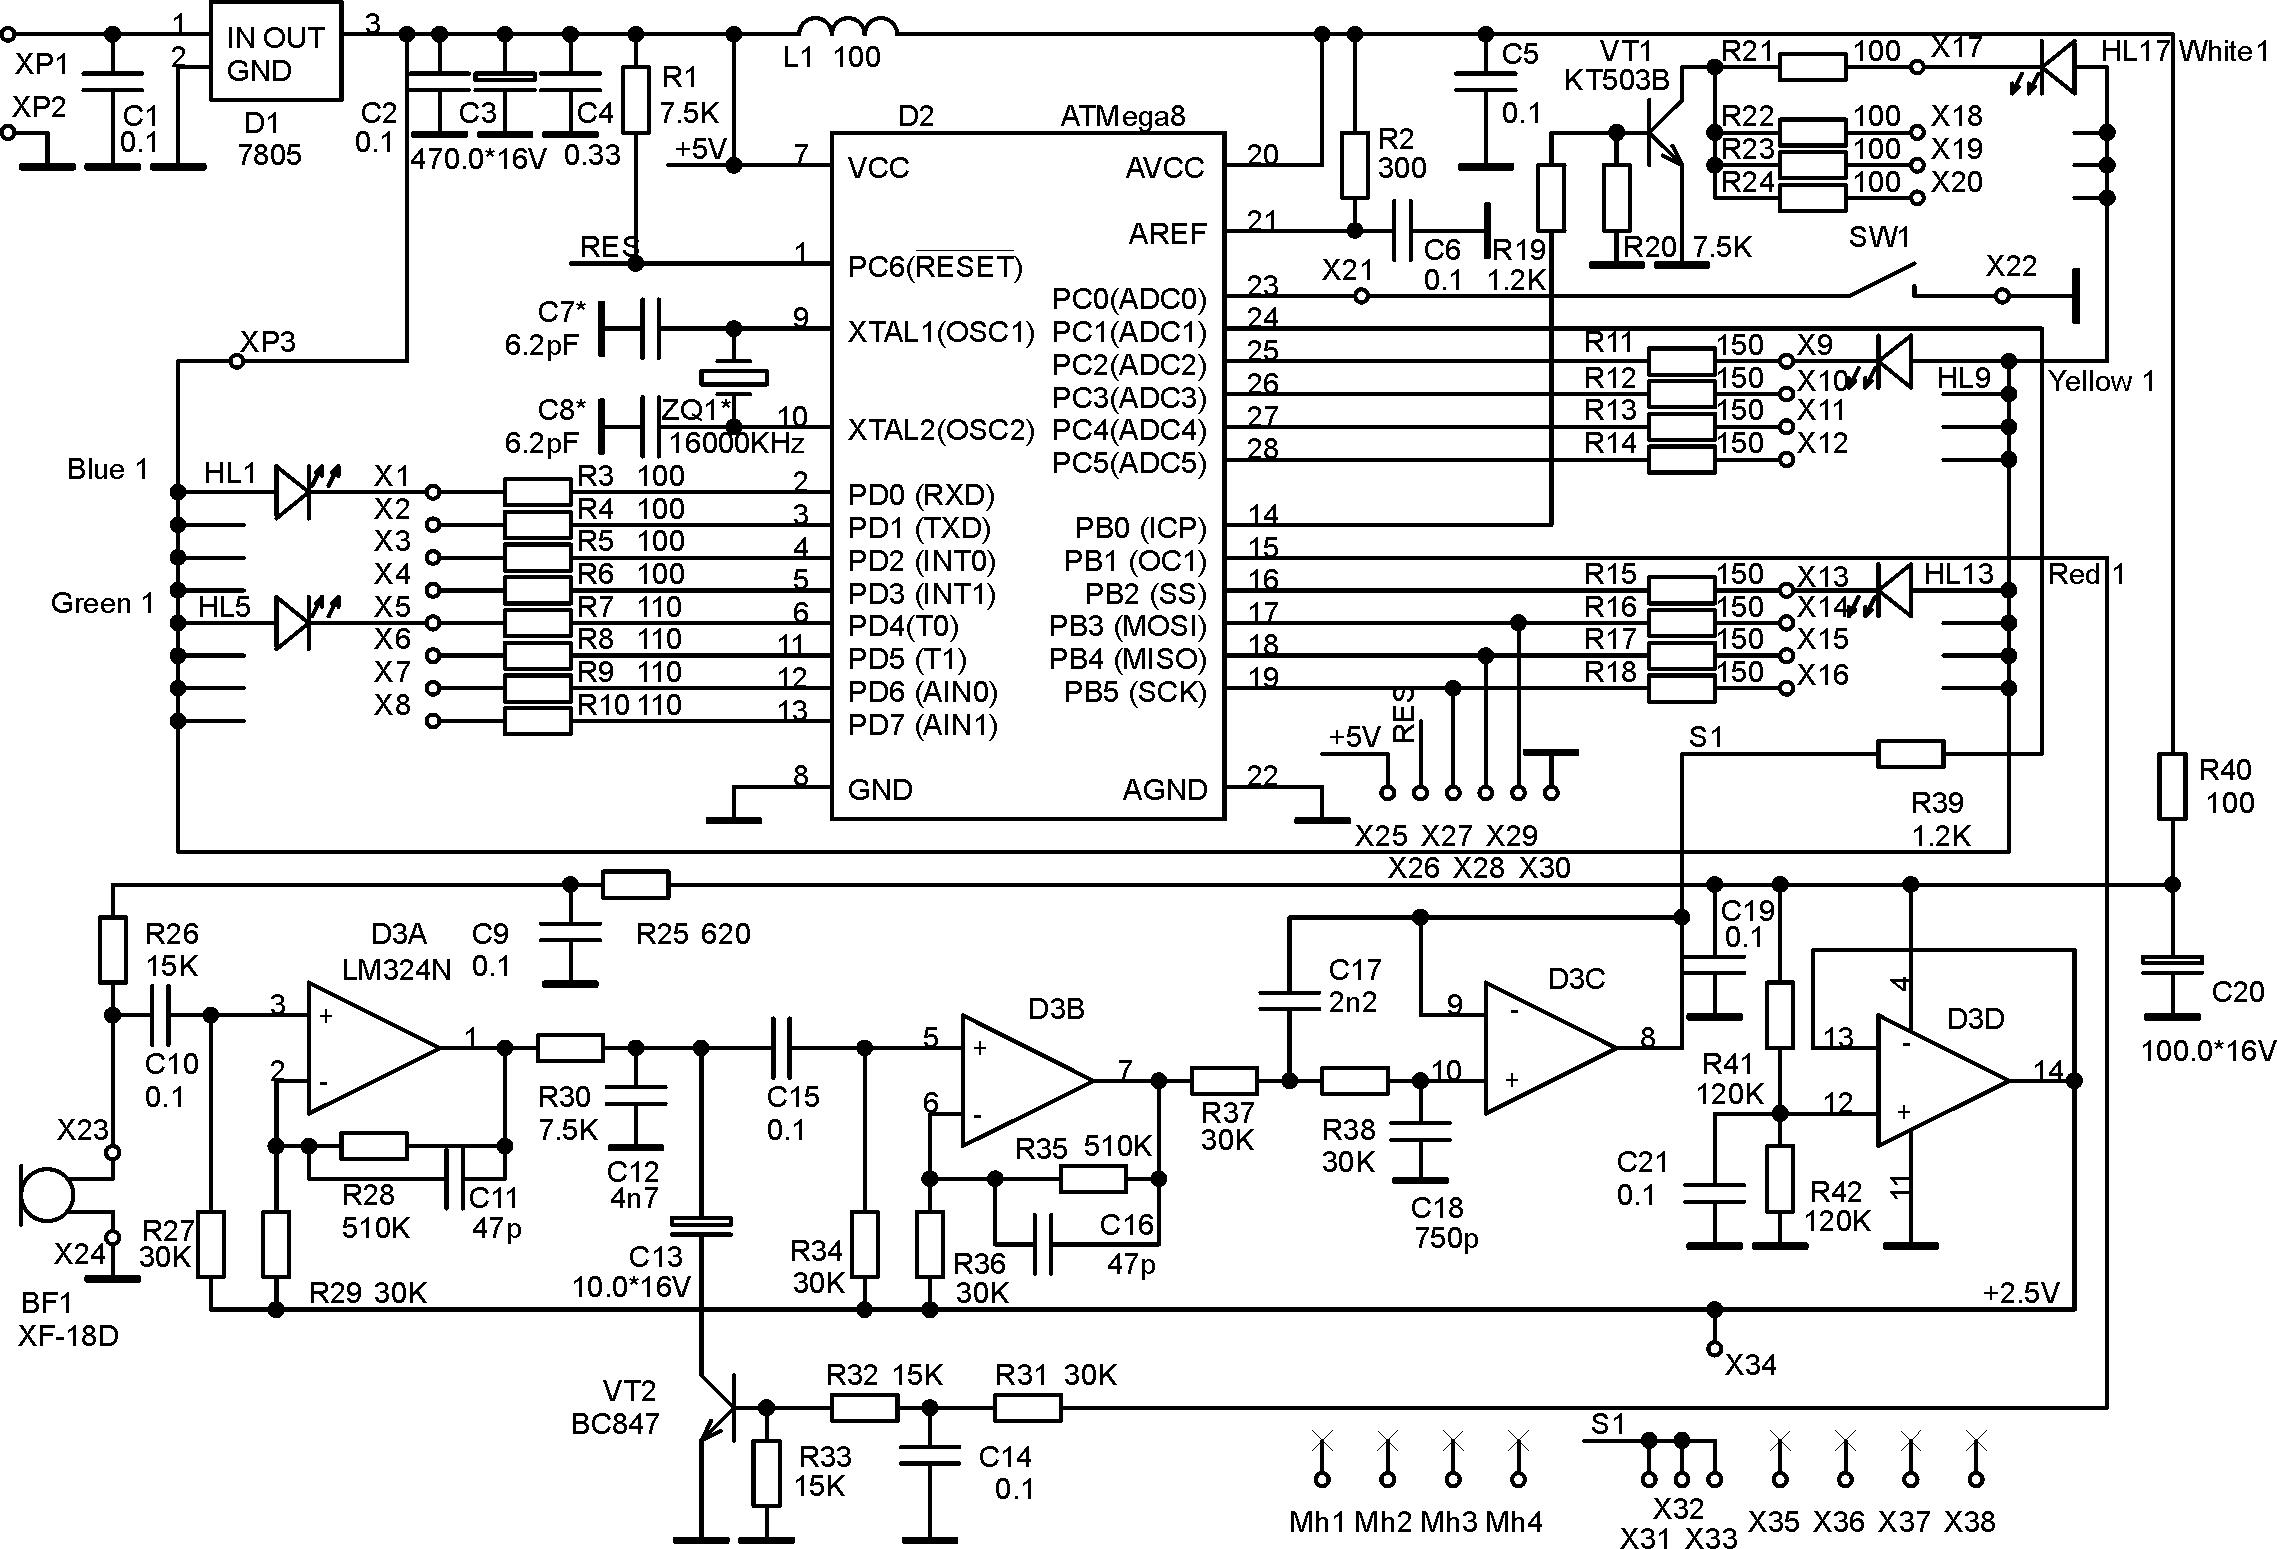 цветомузыка на транзисторах схема